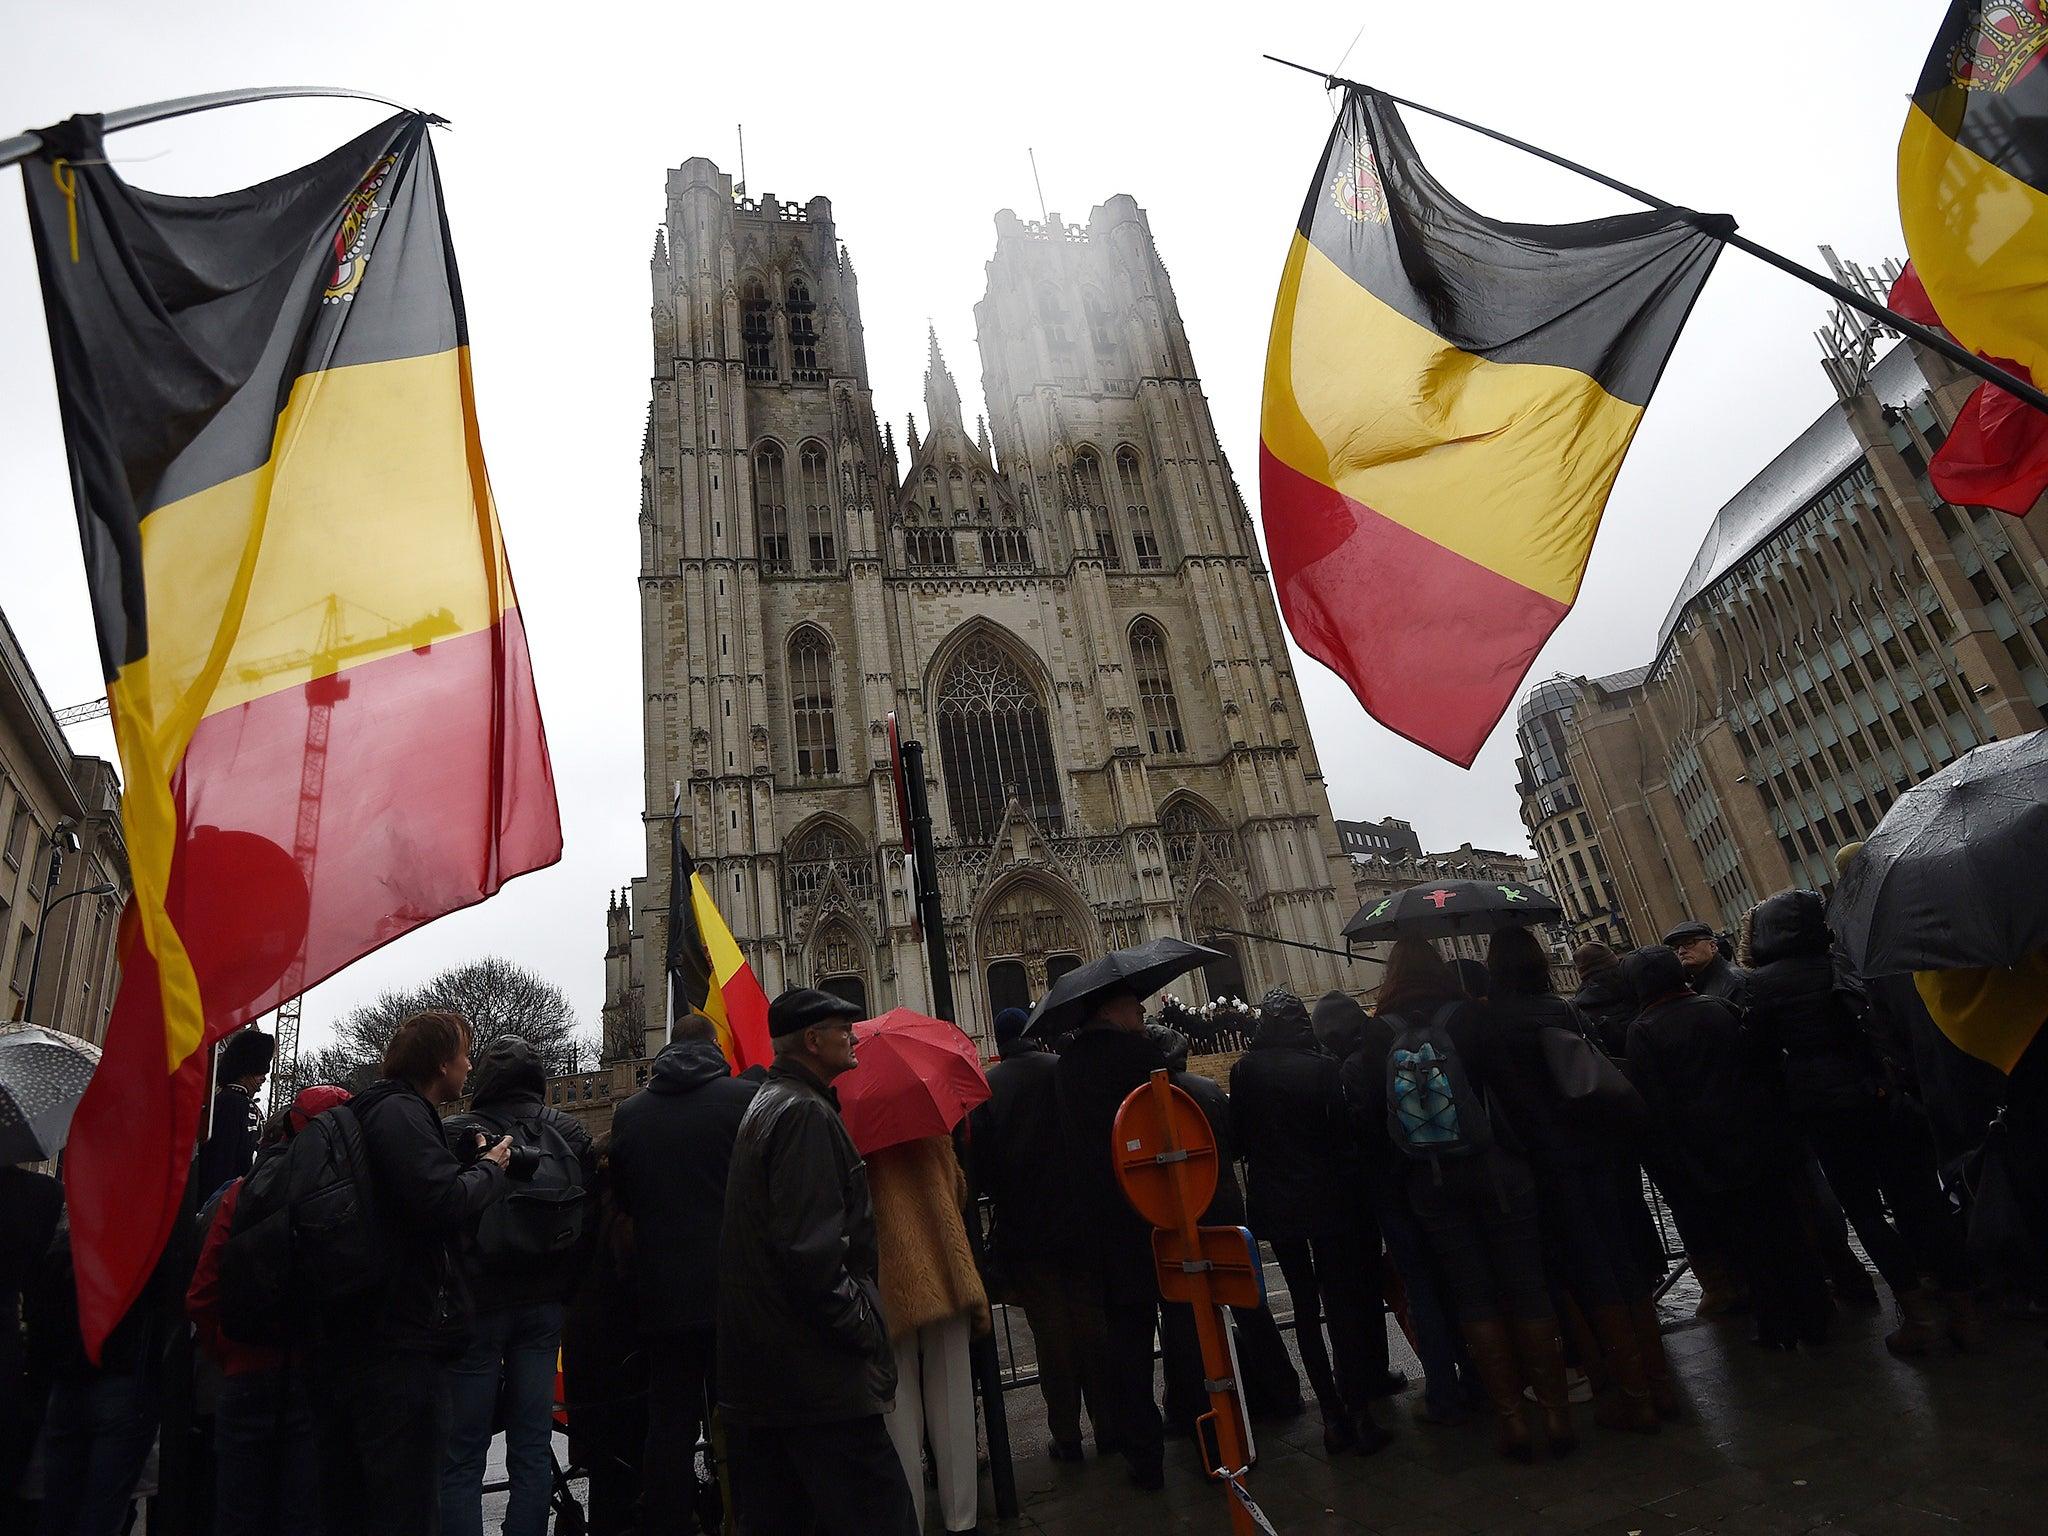 4.Belgium, Denmark, Netherlands, United States